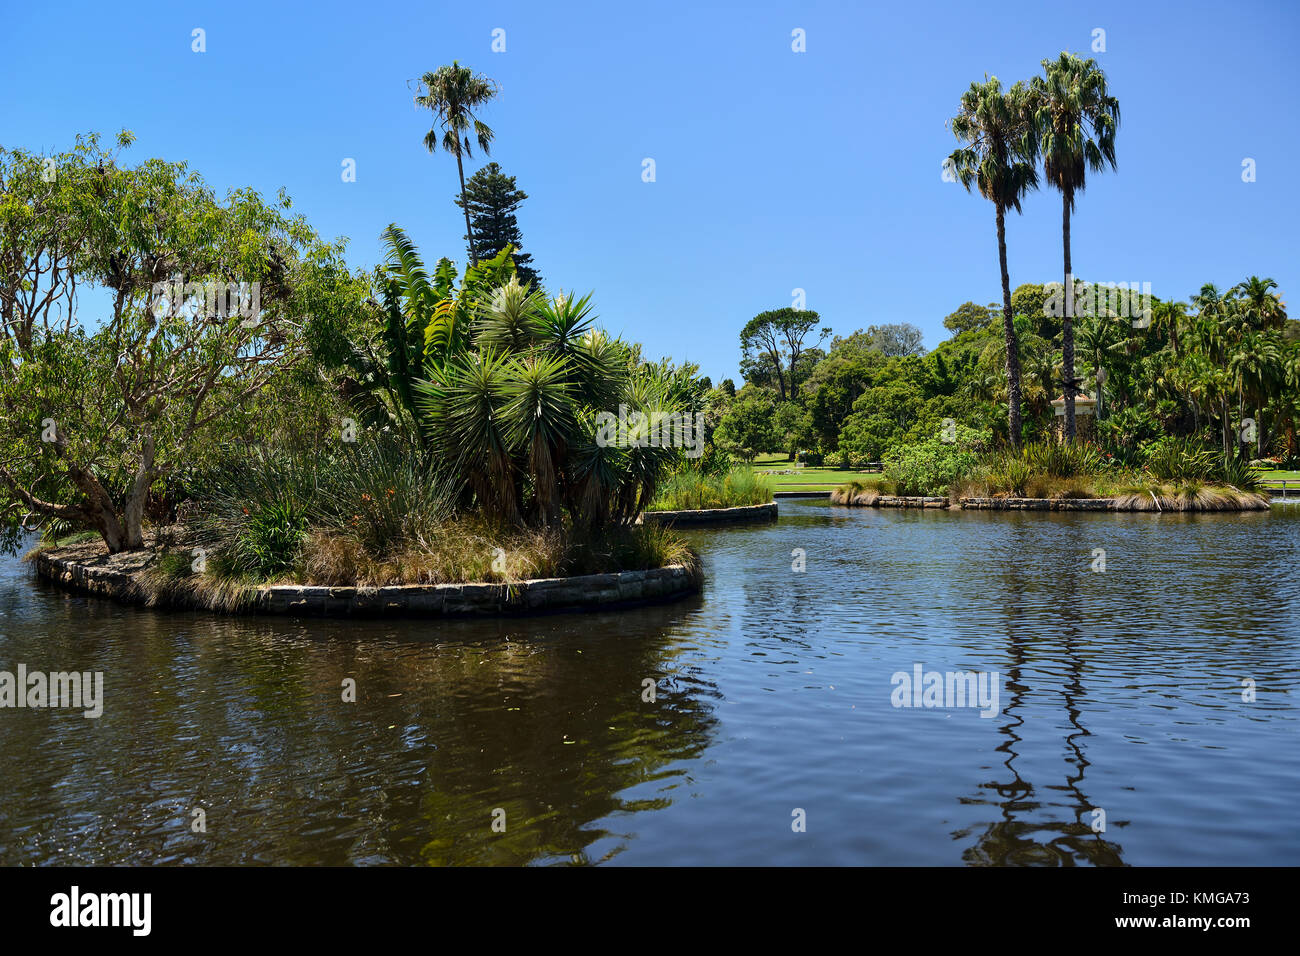 Main pond in Royal Botanic Garden Sydney, New South Wales, Australia - Stock Image